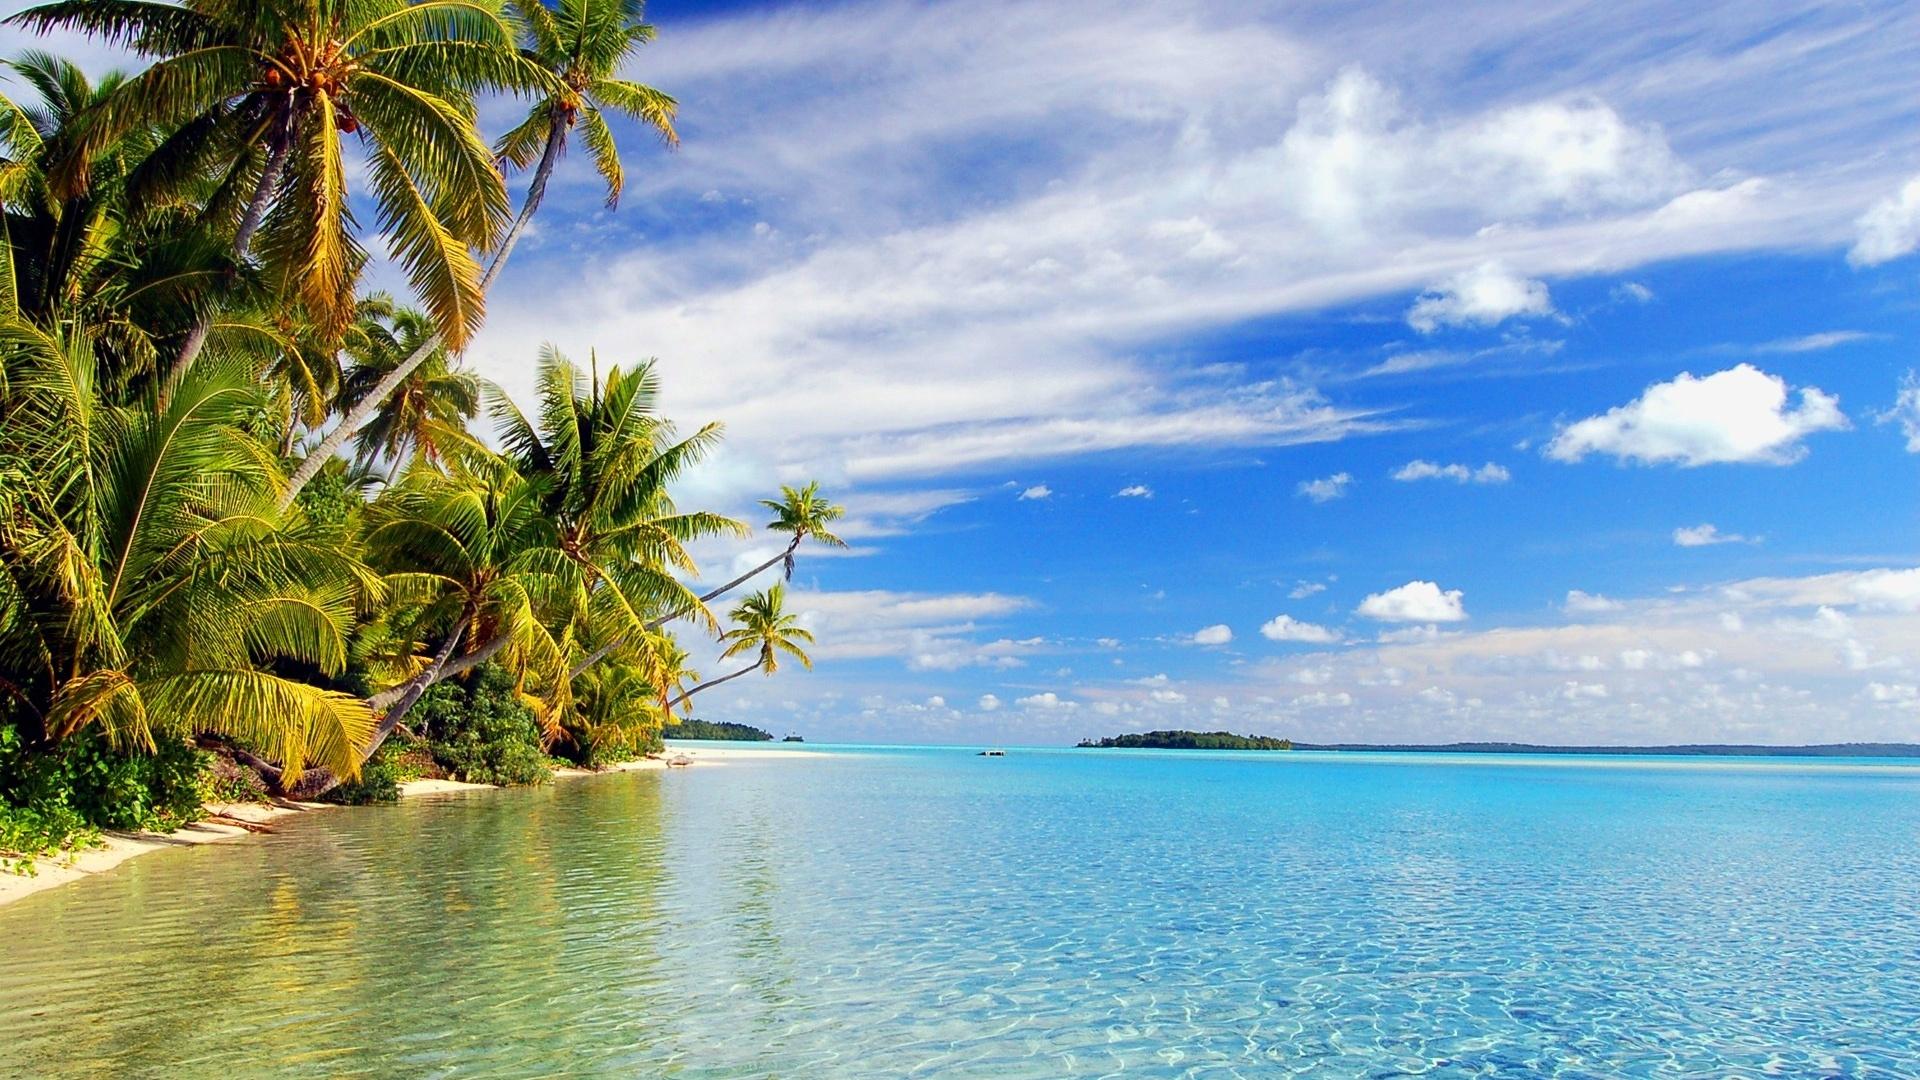 Tropical beach Wallpaper | 1920x1080 Full HD resolution ...